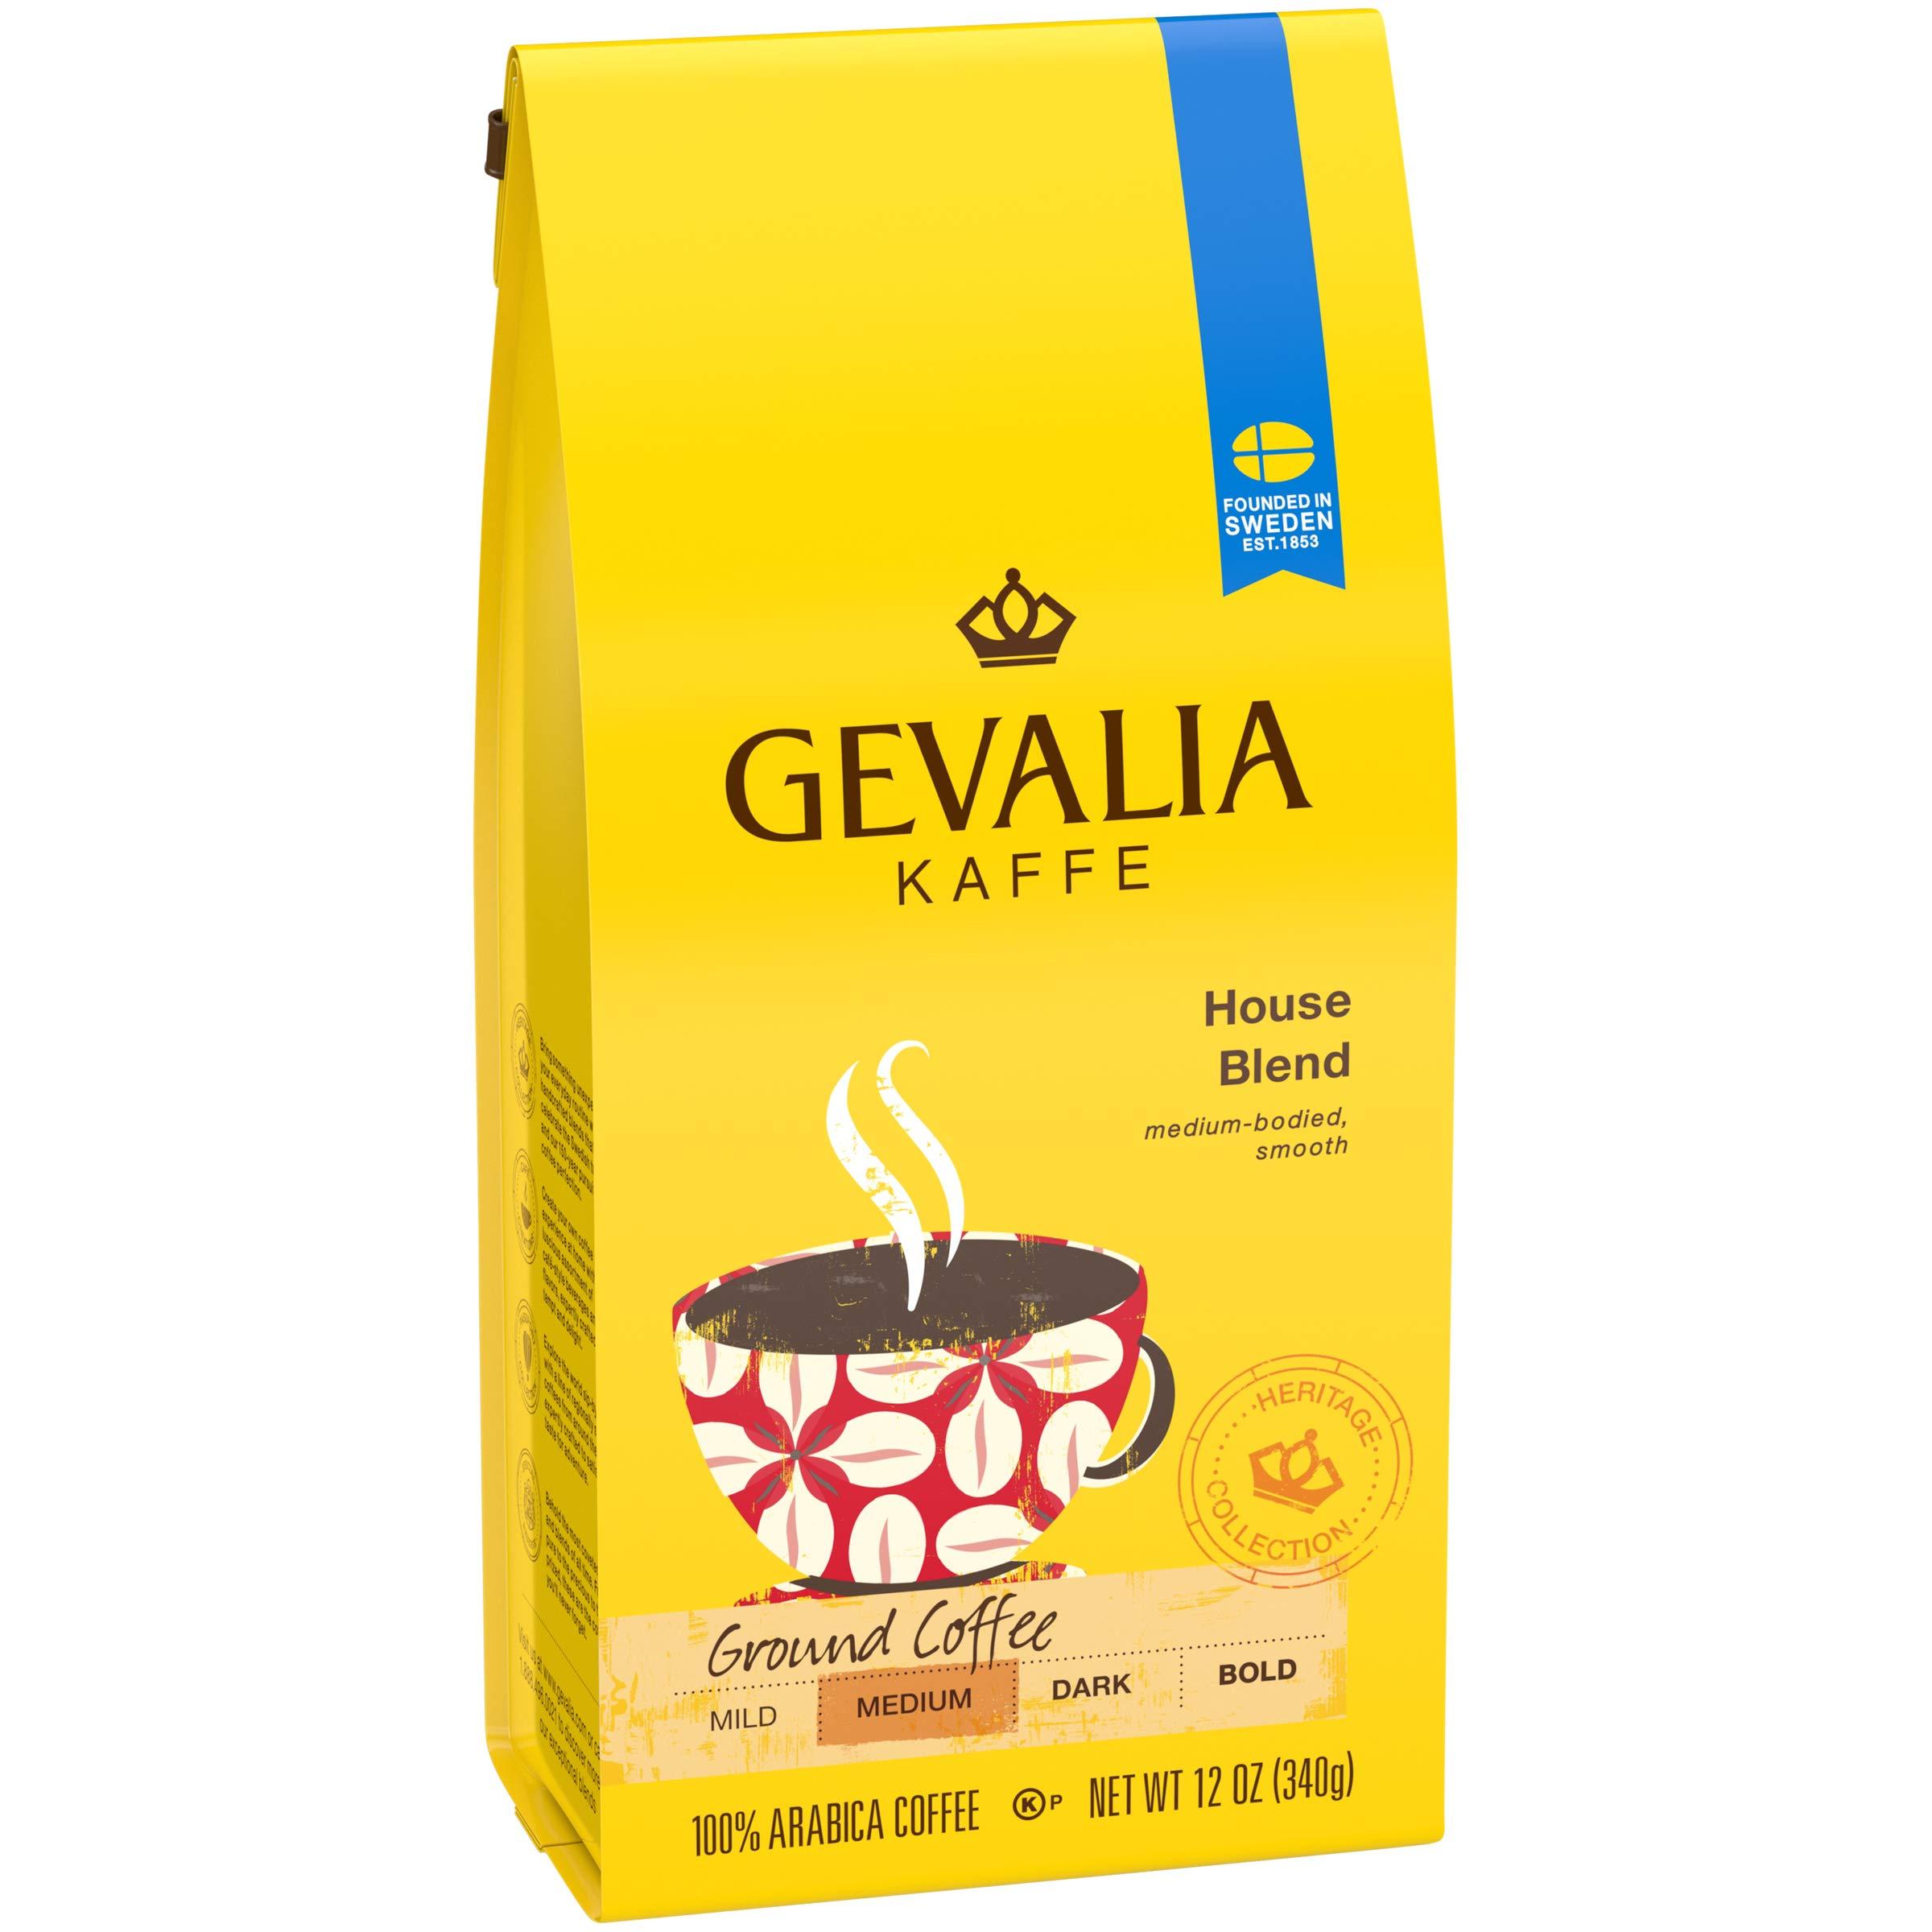 Gevalia House Blend Ground Coffee (12 oz Bags, Pack of 6) by Gevalia